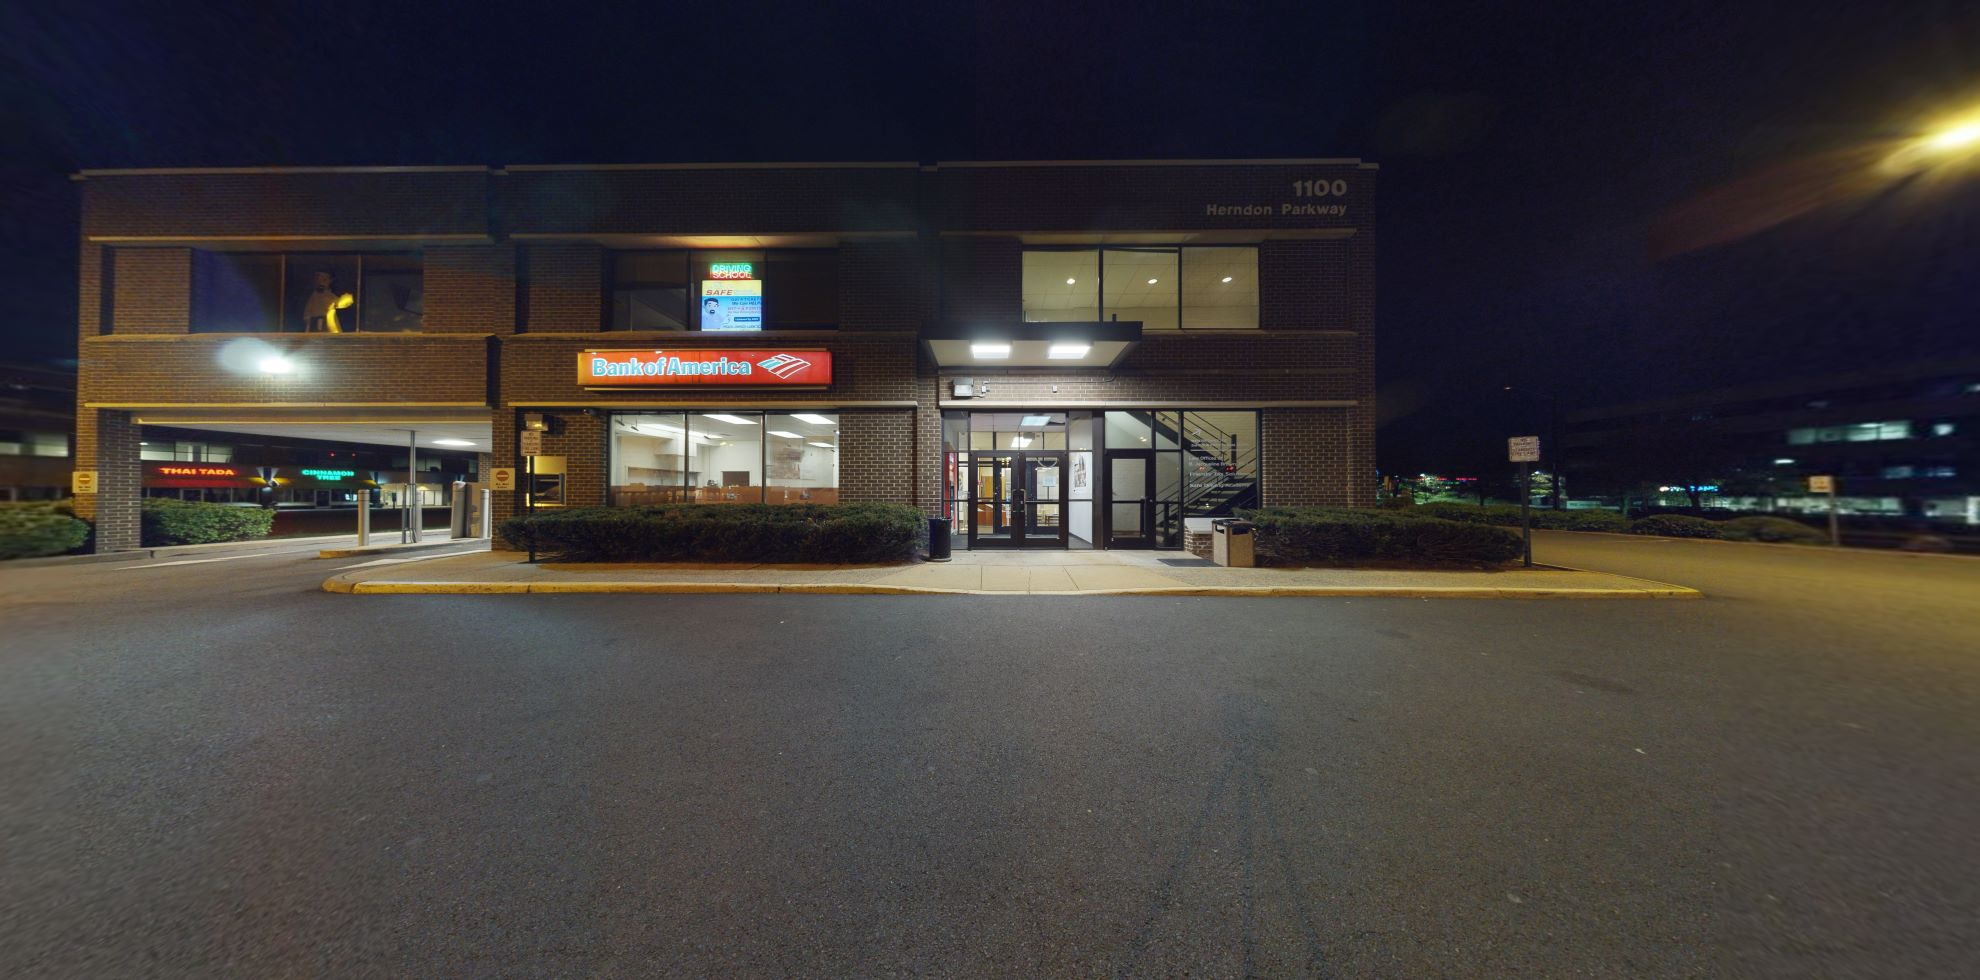 Bank of America financial center with drive-thru ATM | 1100 Herndon Pkwy, Herndon, VA 20170